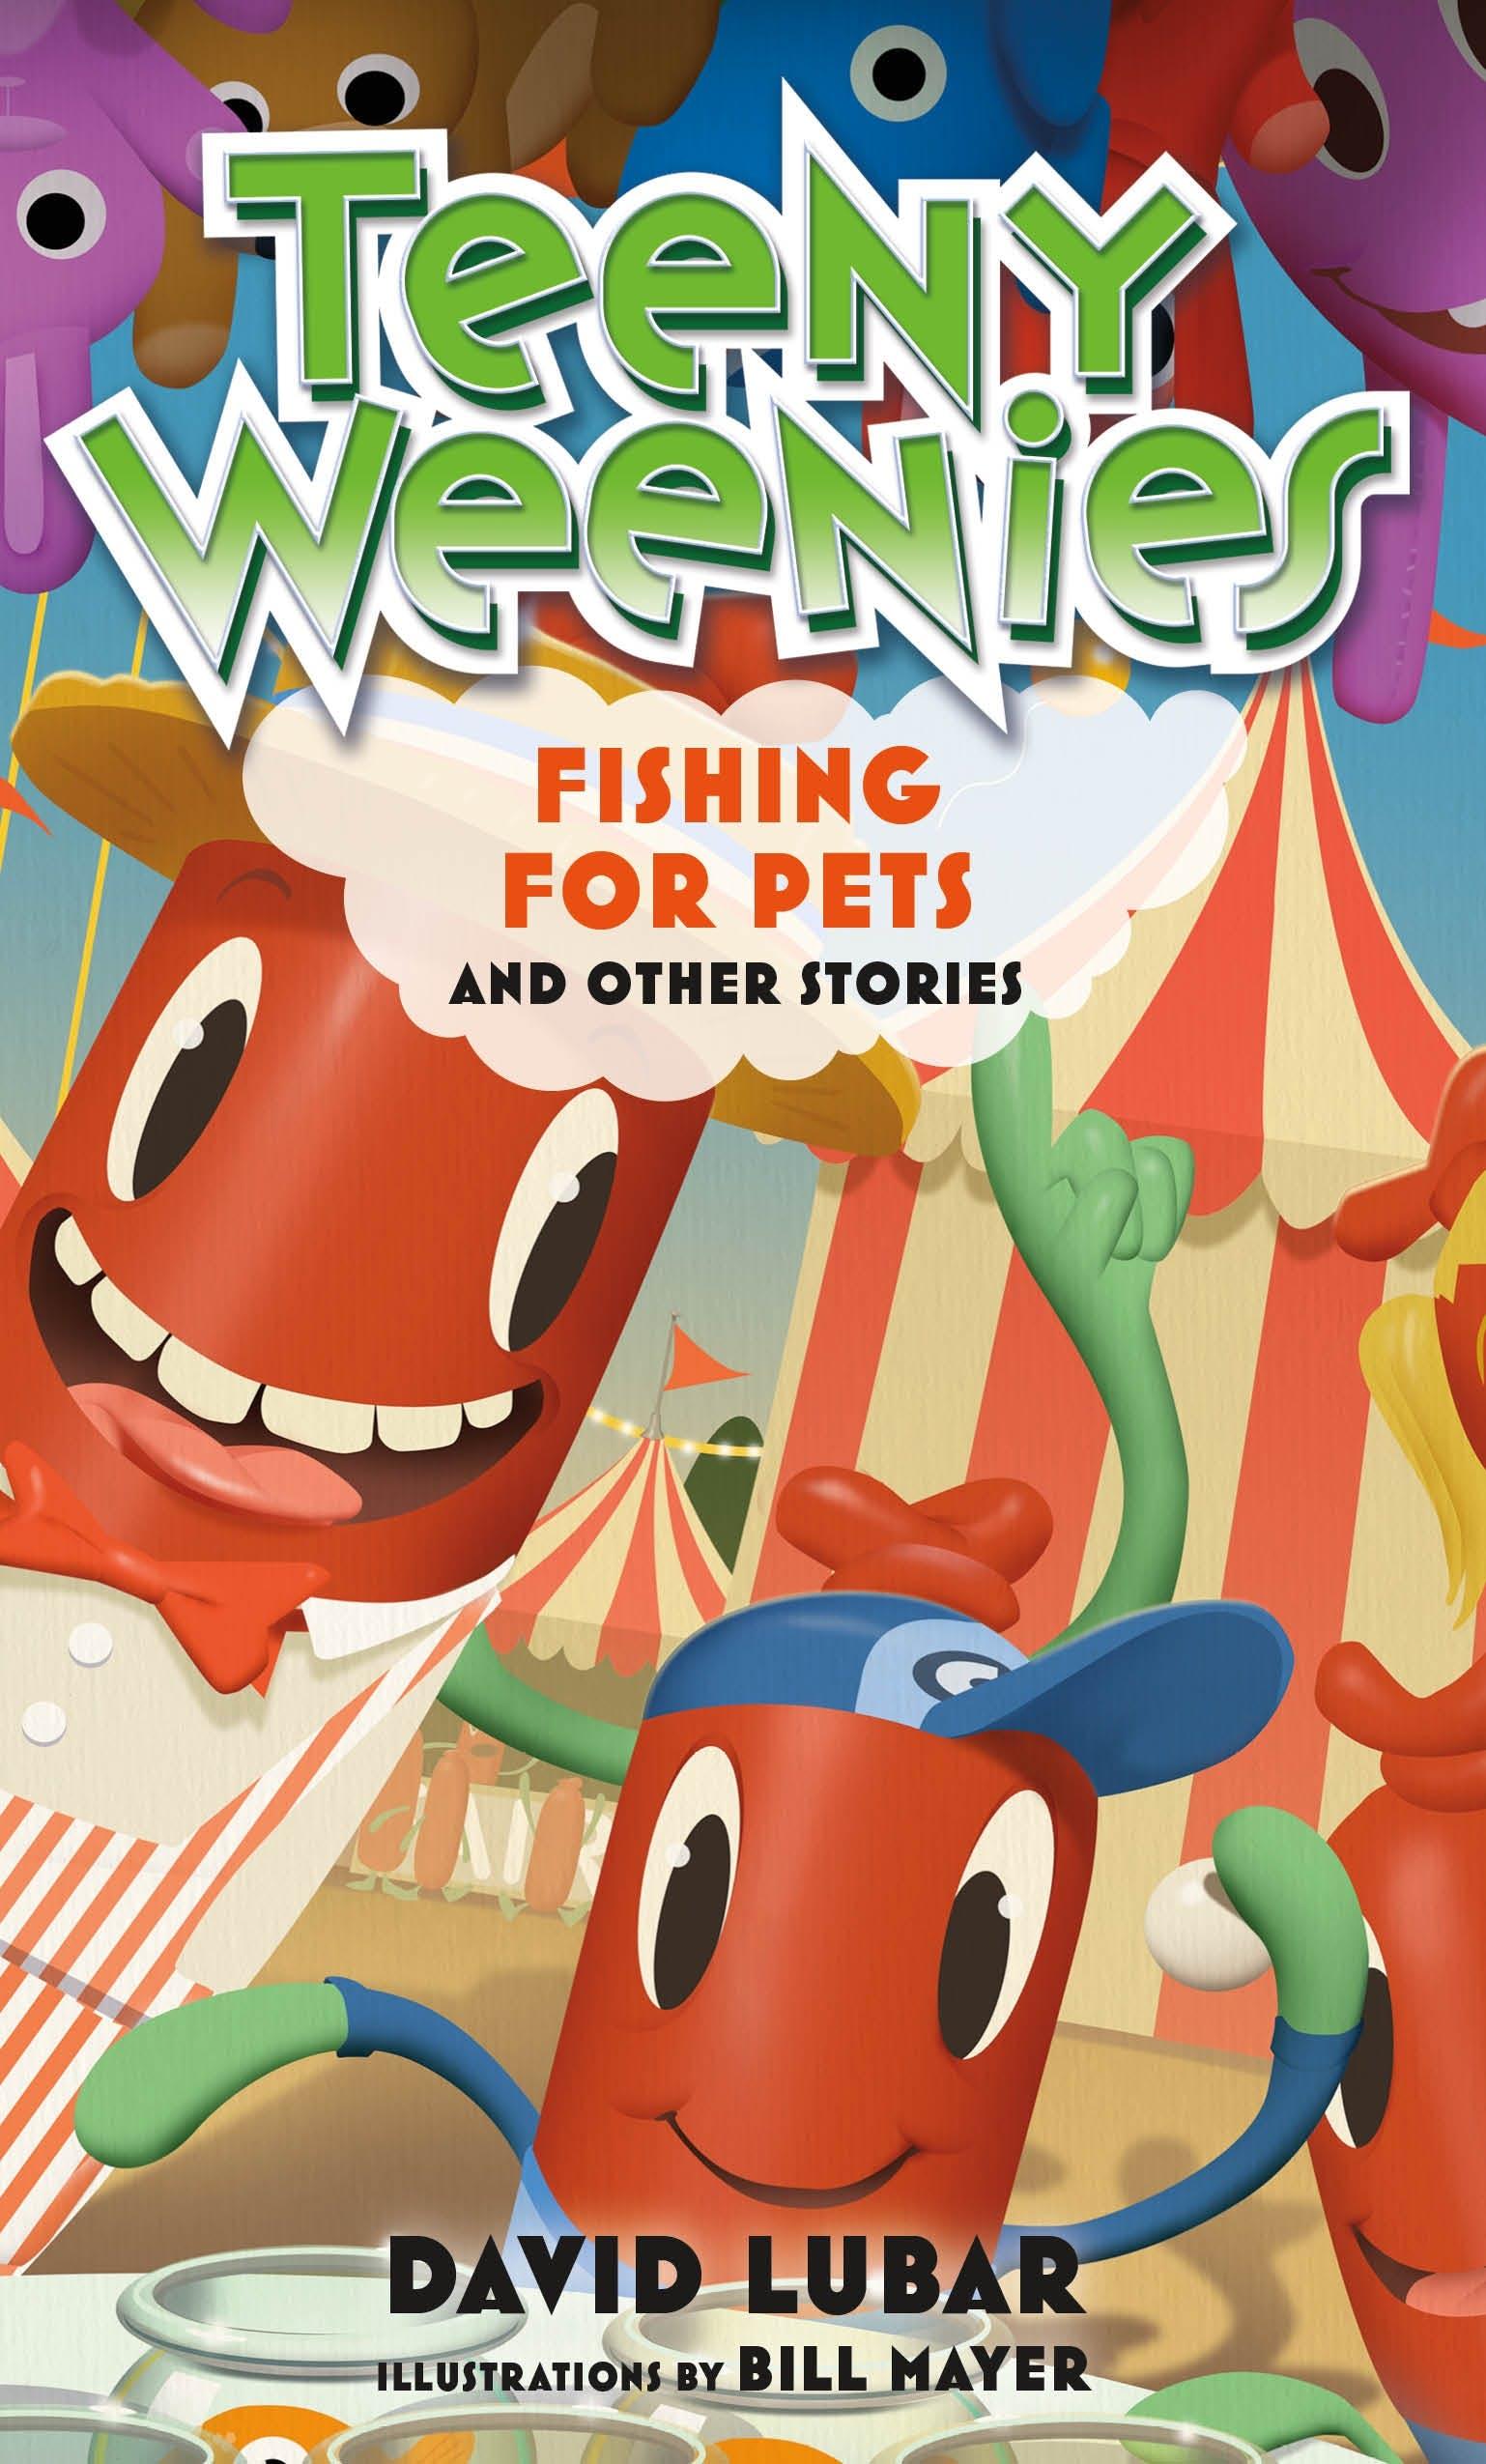 Image of Teeny Weenies: Fishing for Pets